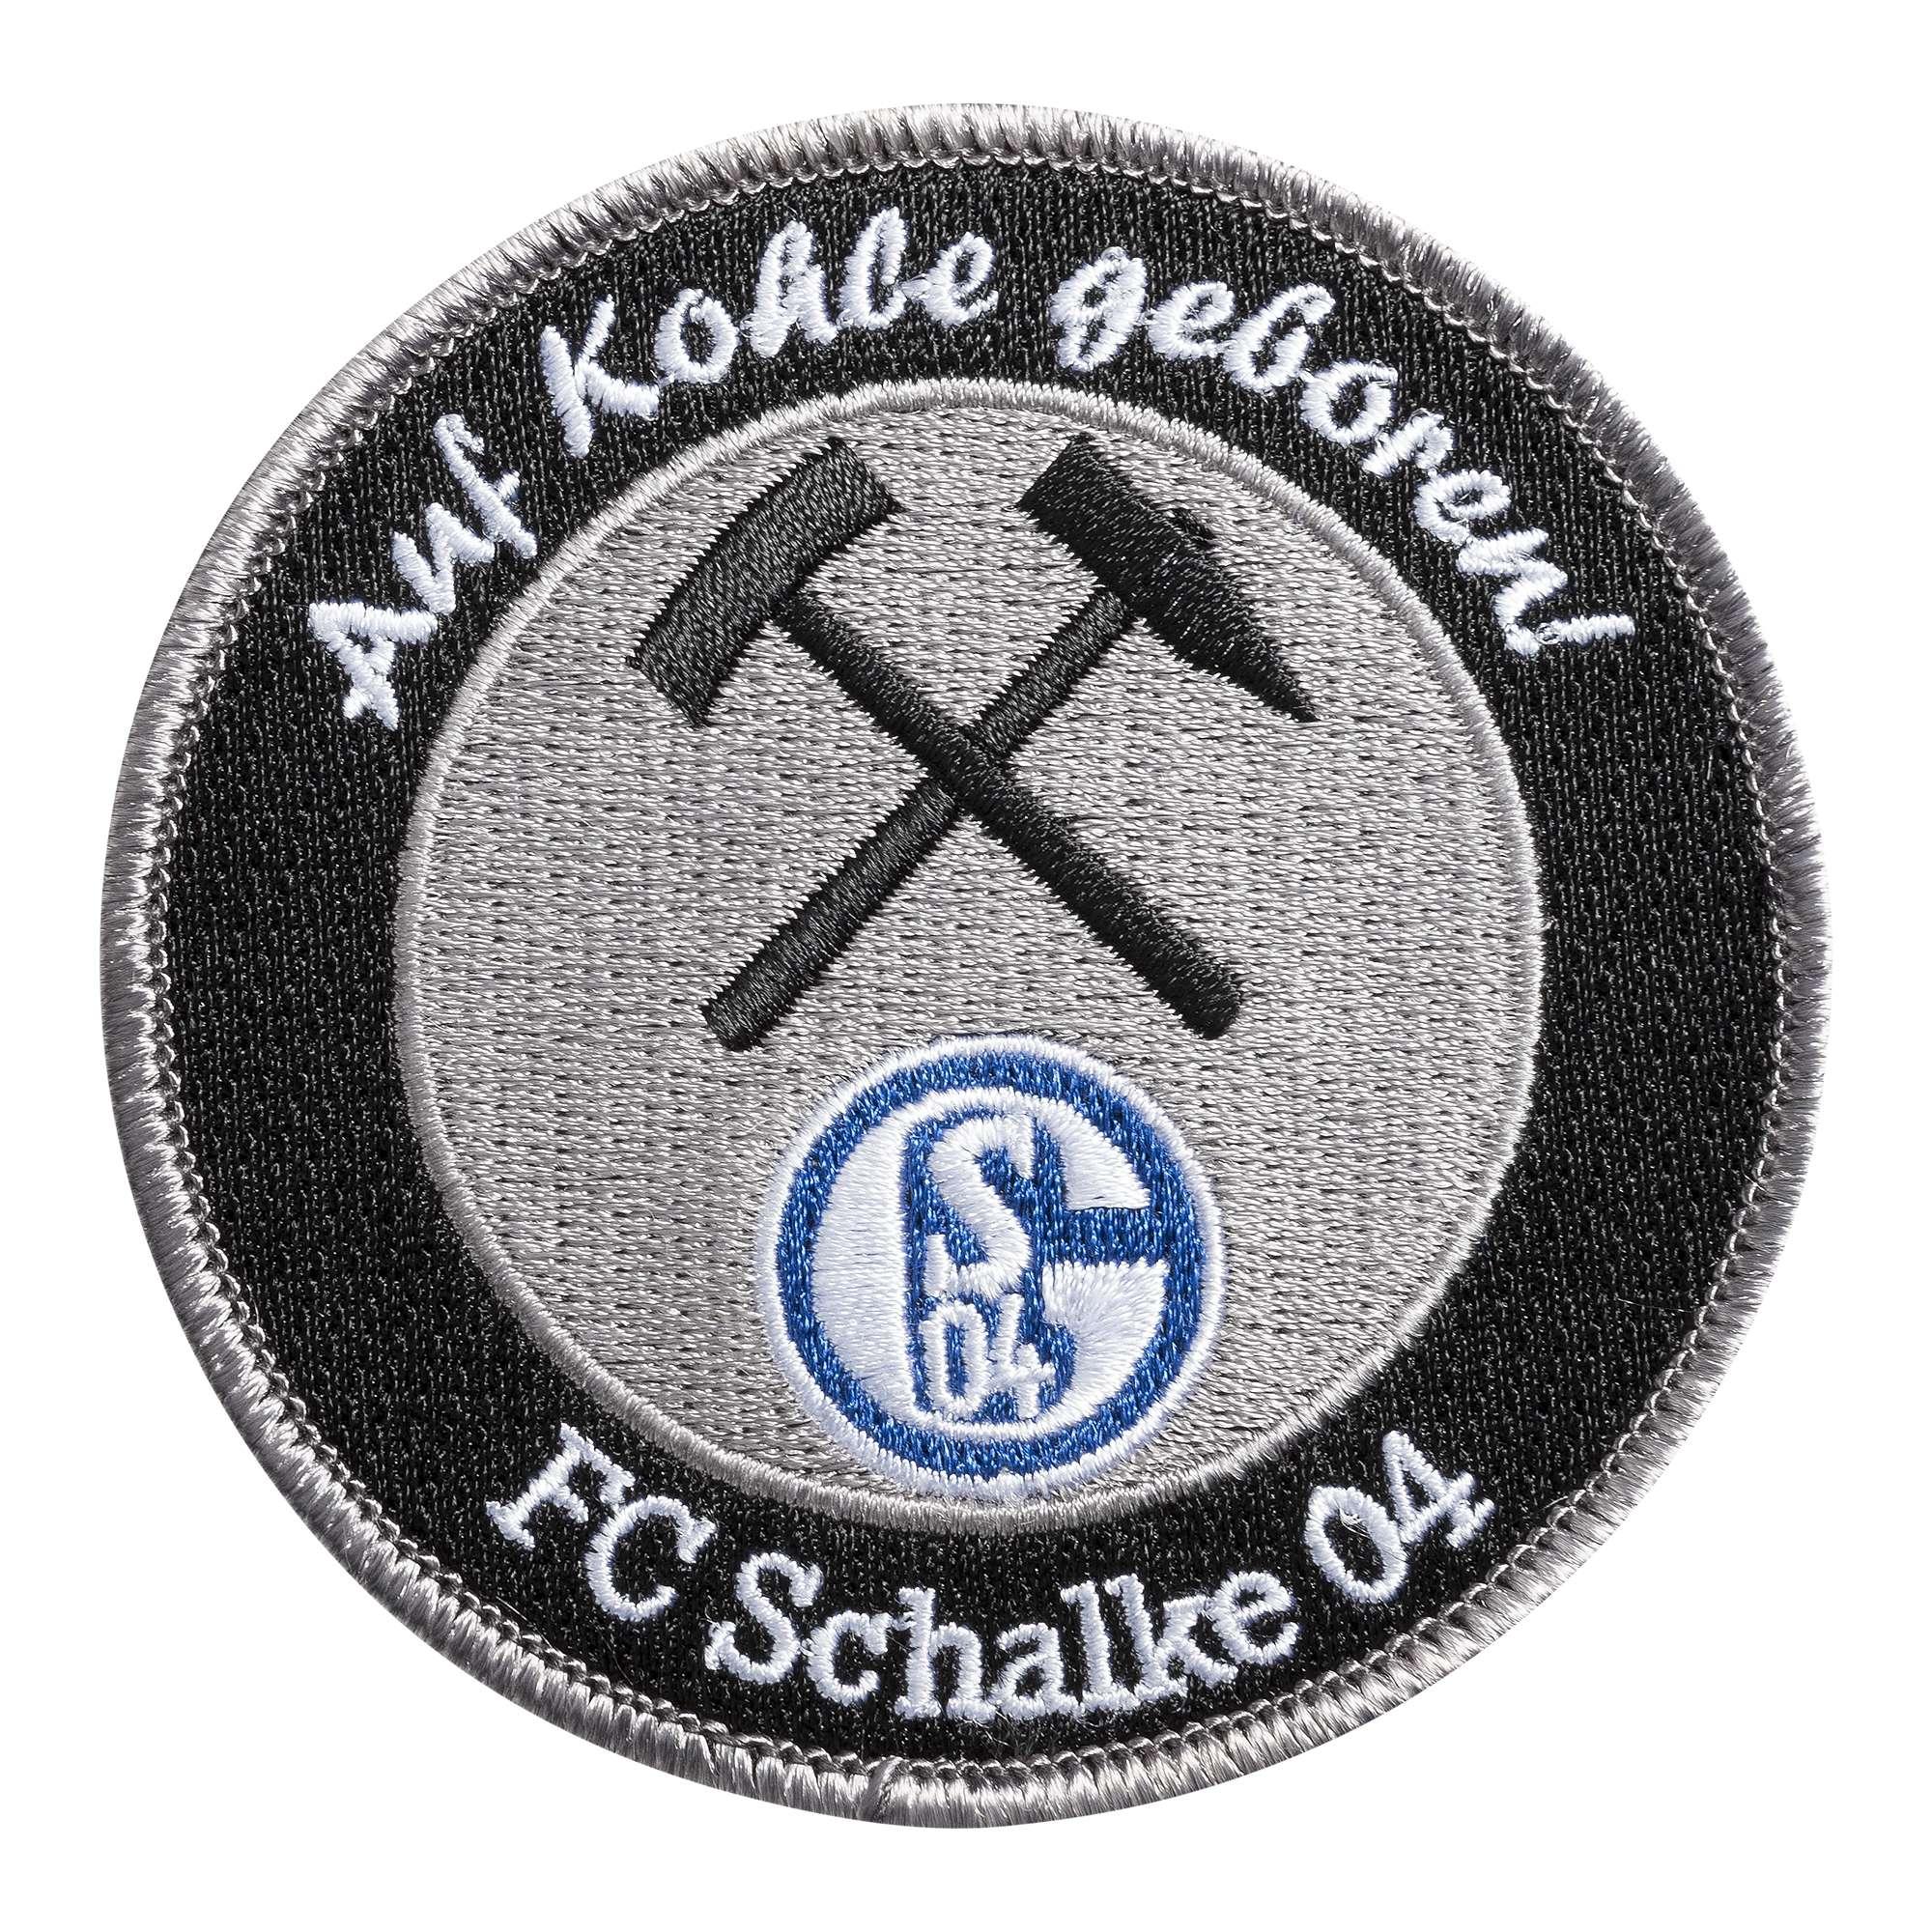 FC Schalke 04 Herren Sweat-Jacke Auf Kohle geboren